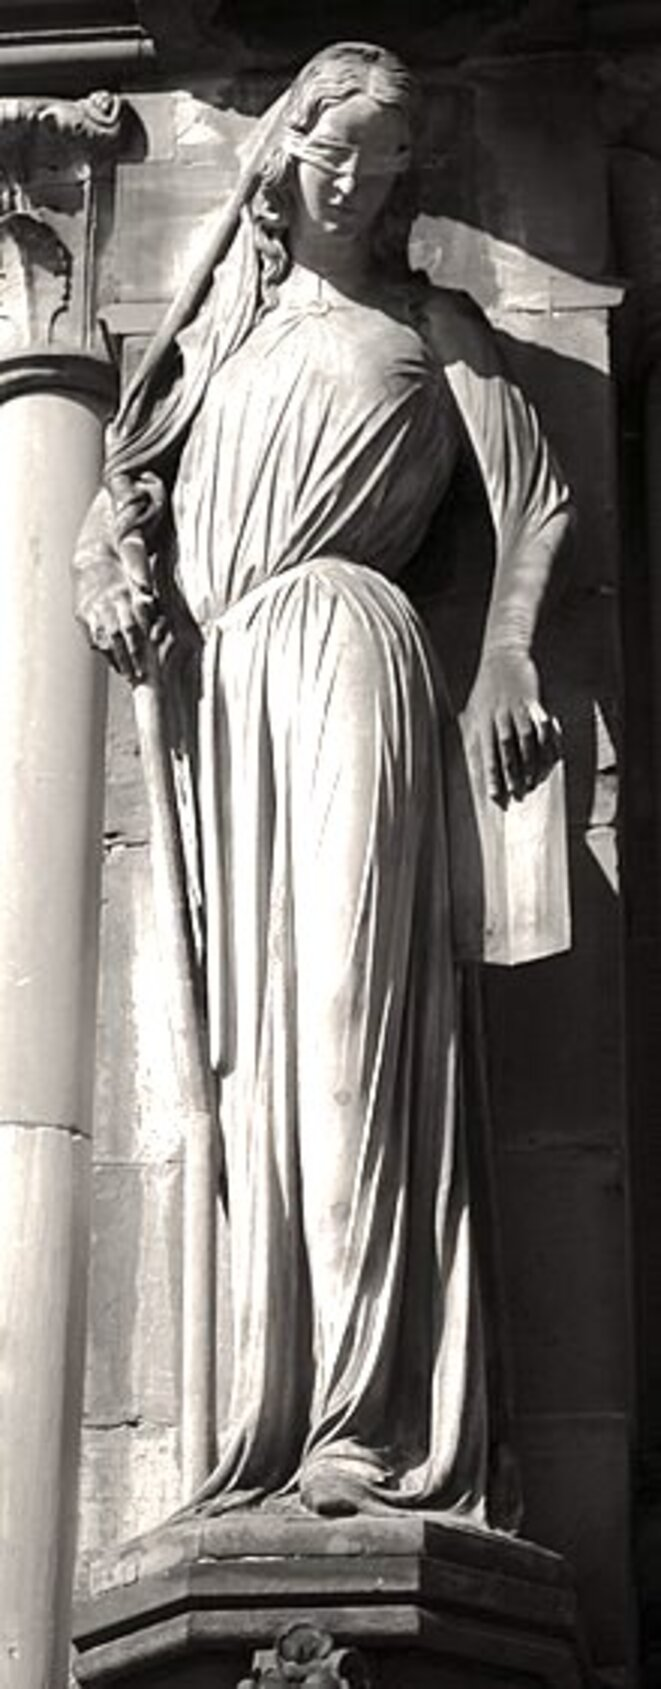 strasbourg-cathe-drale-notre-dame-statue-de-la-synagogue